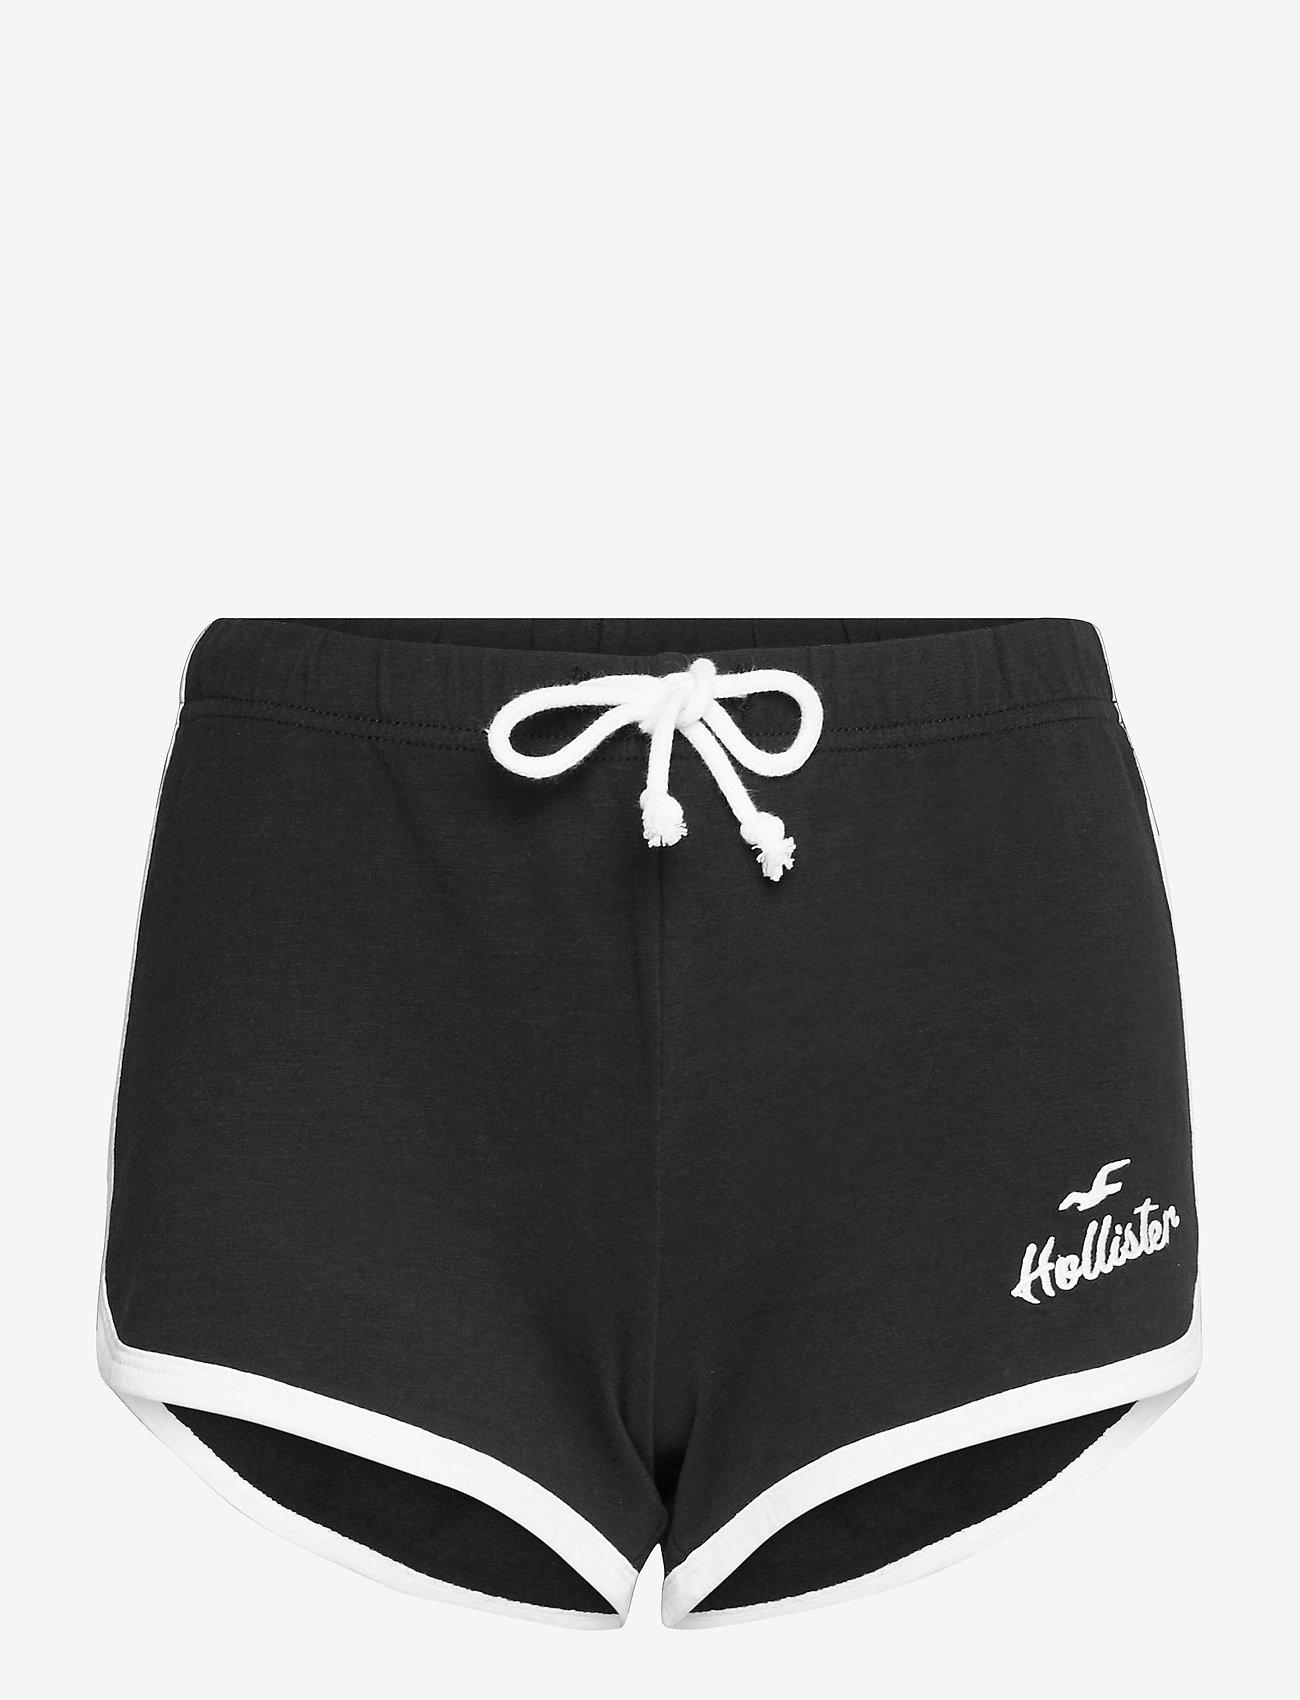 Hollister - HCo. GIRLS SHORTS - shorts casual - black - 0